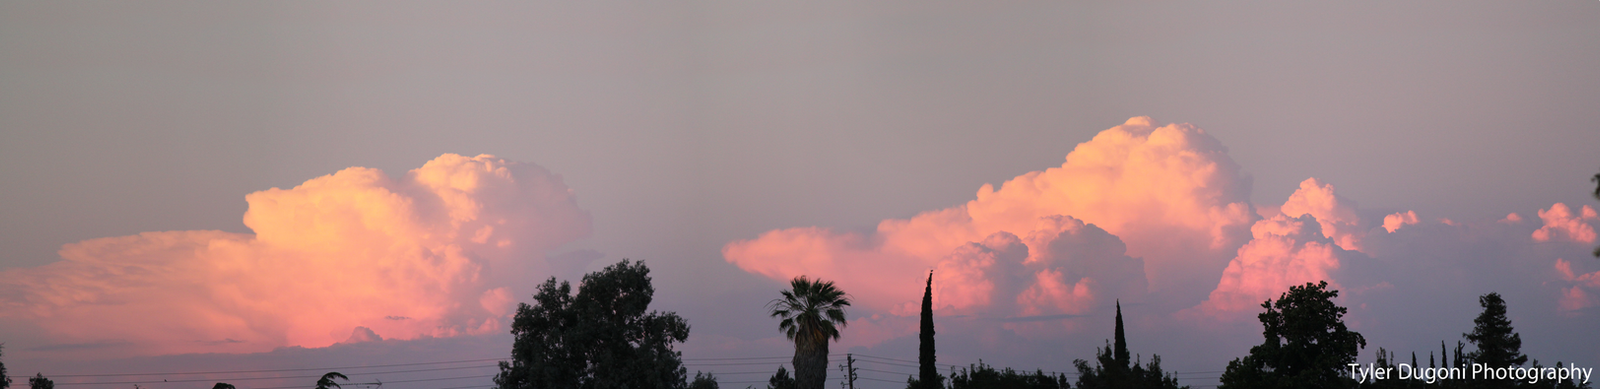 Sky Lit Cloud Panorama by Tjdyo